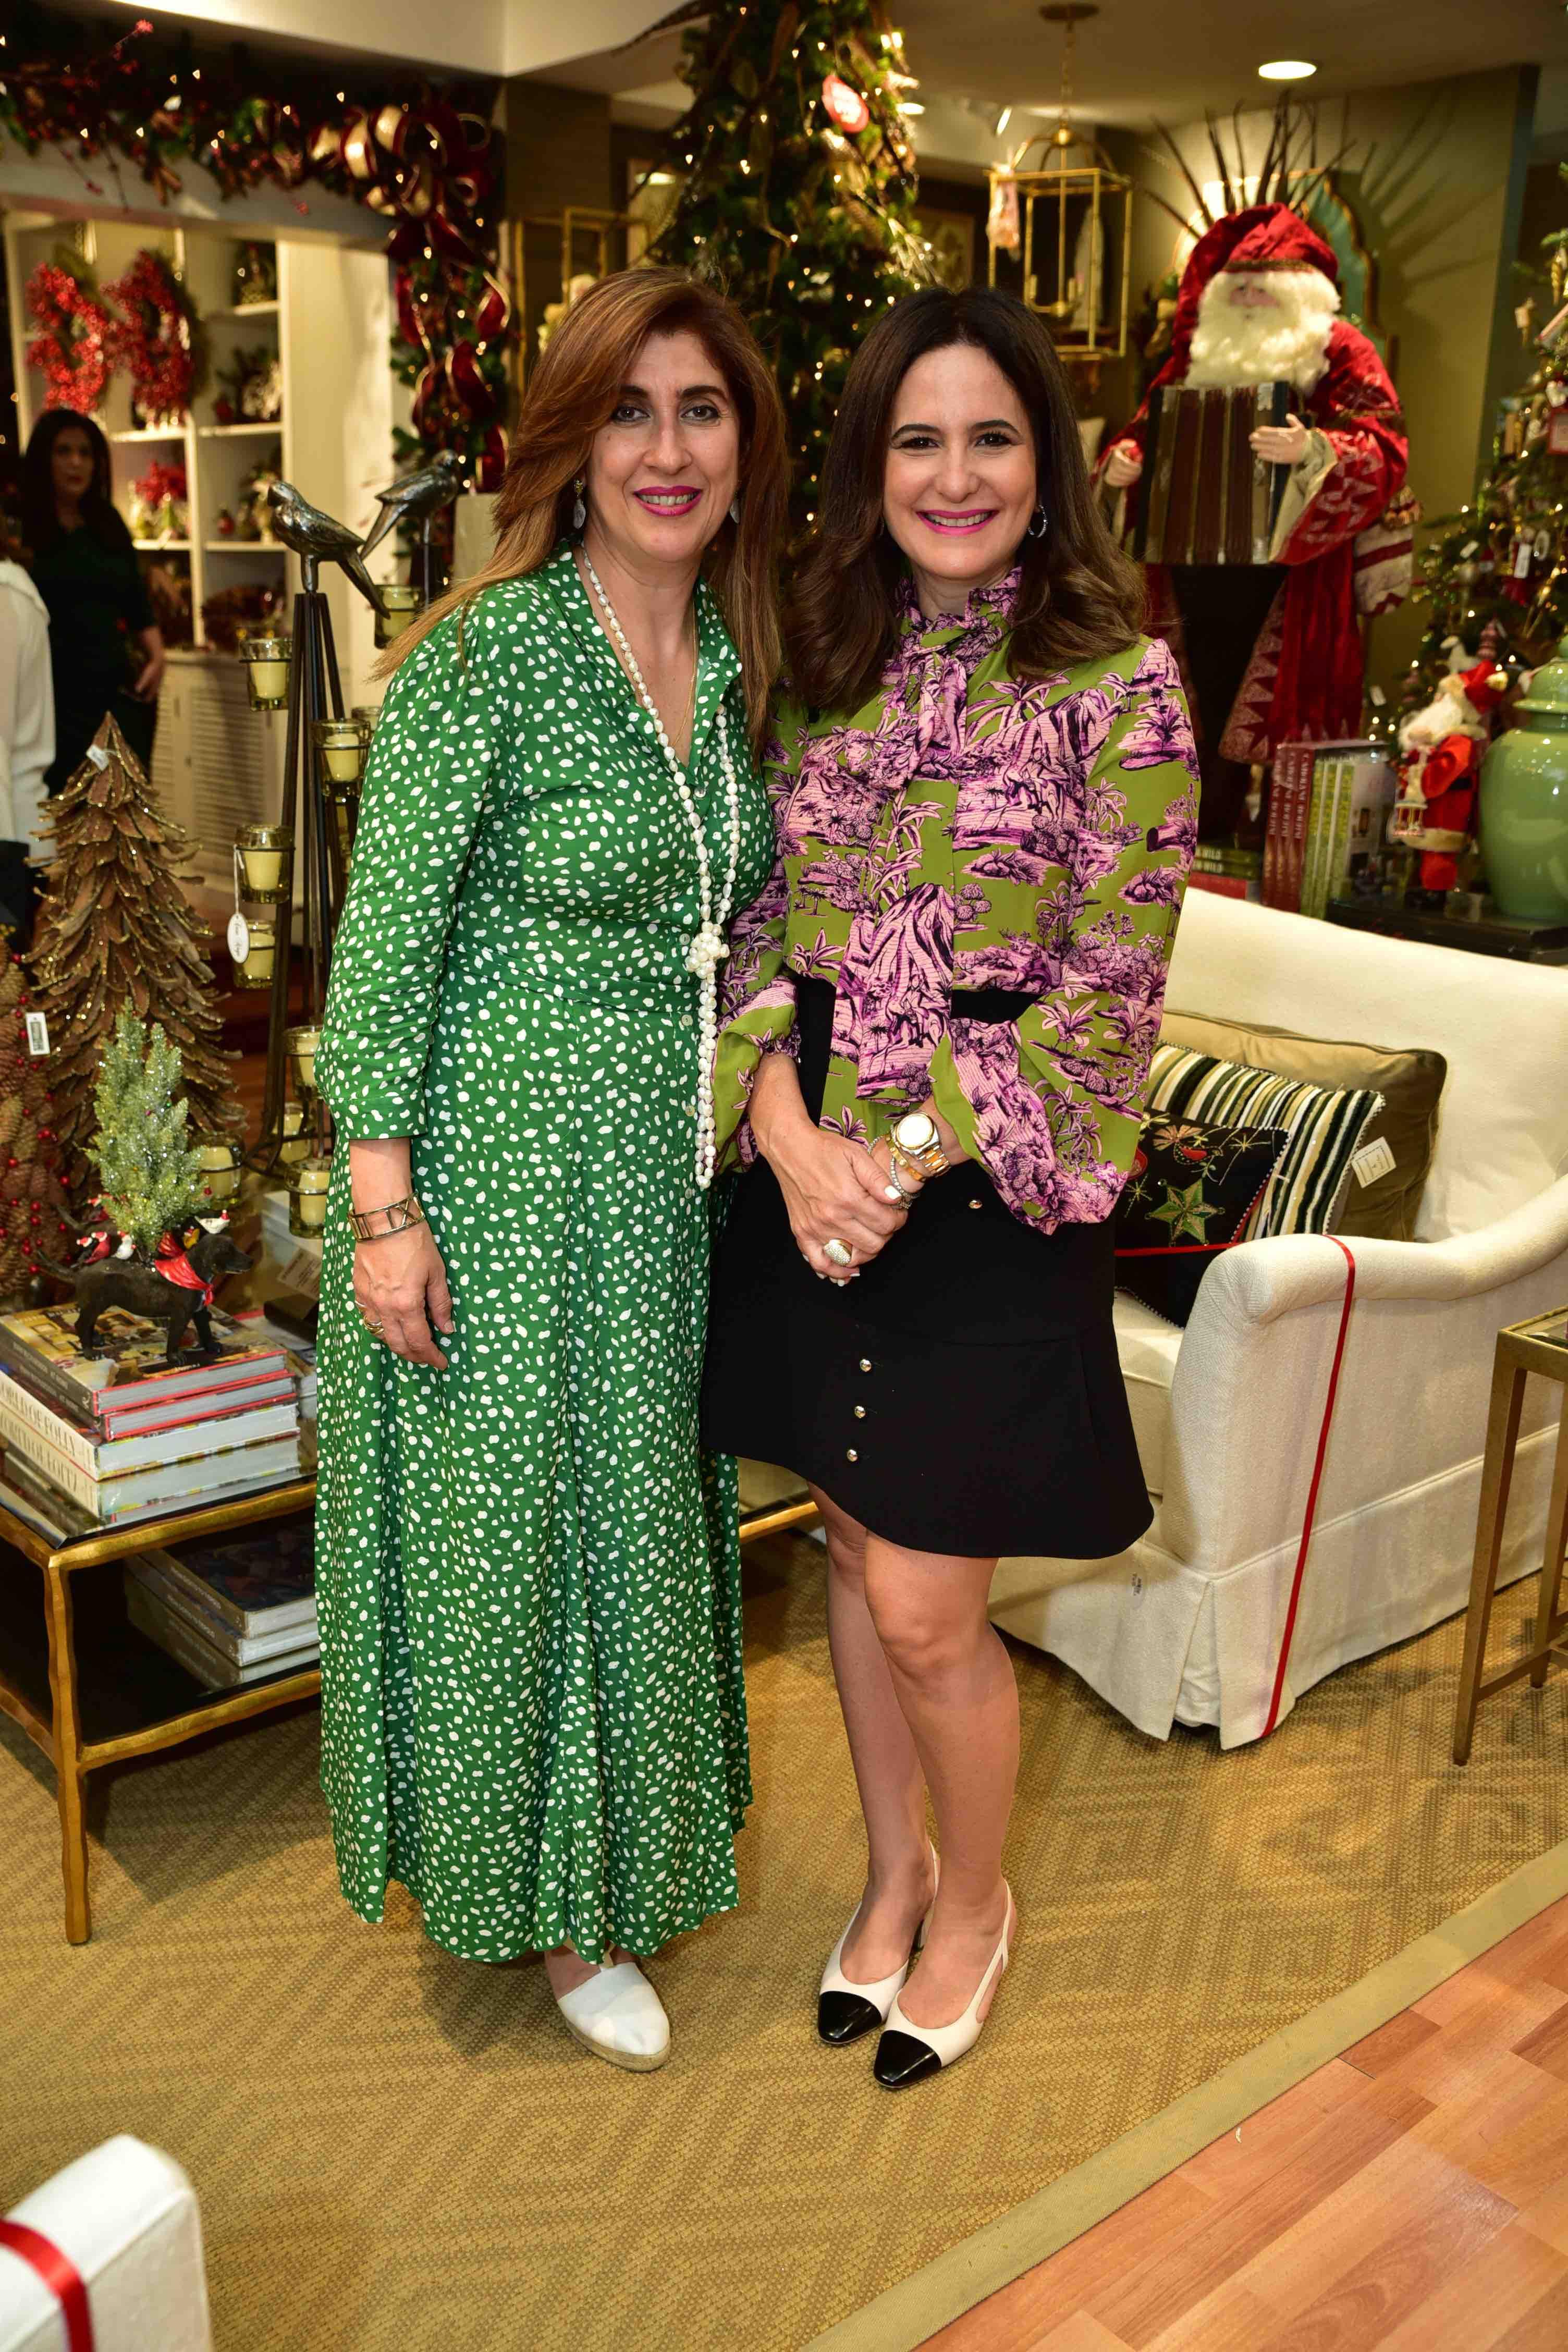 Desiree Bonetti & Bethania de Rizek